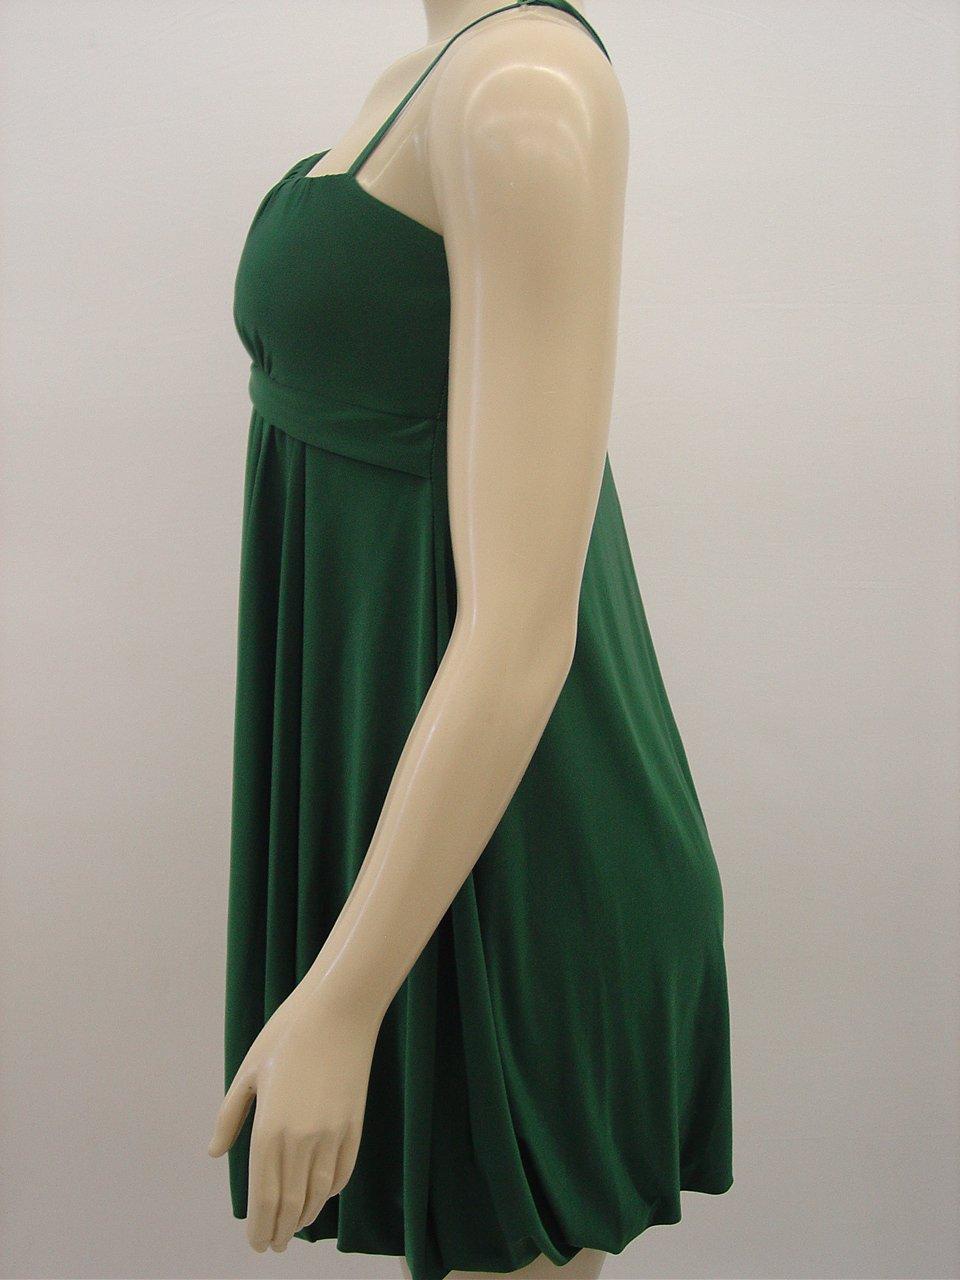 NEW BUBBLE EMERALD GREEN COCKTAIL DRESS- MEDIUM